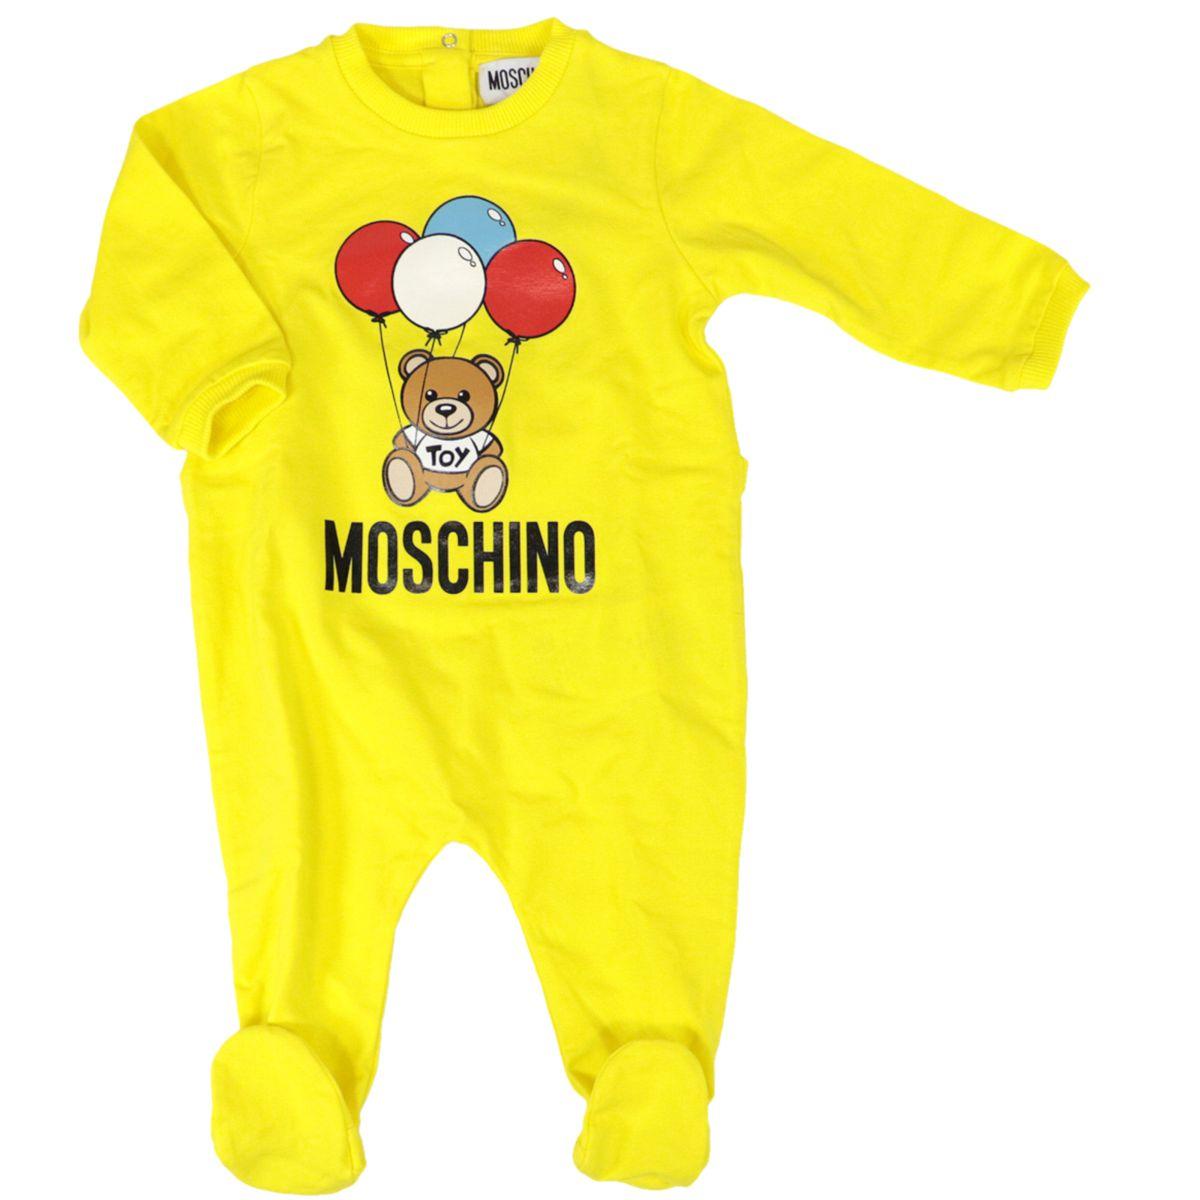 Cotton onesie with bear logo print Yellow Moschino